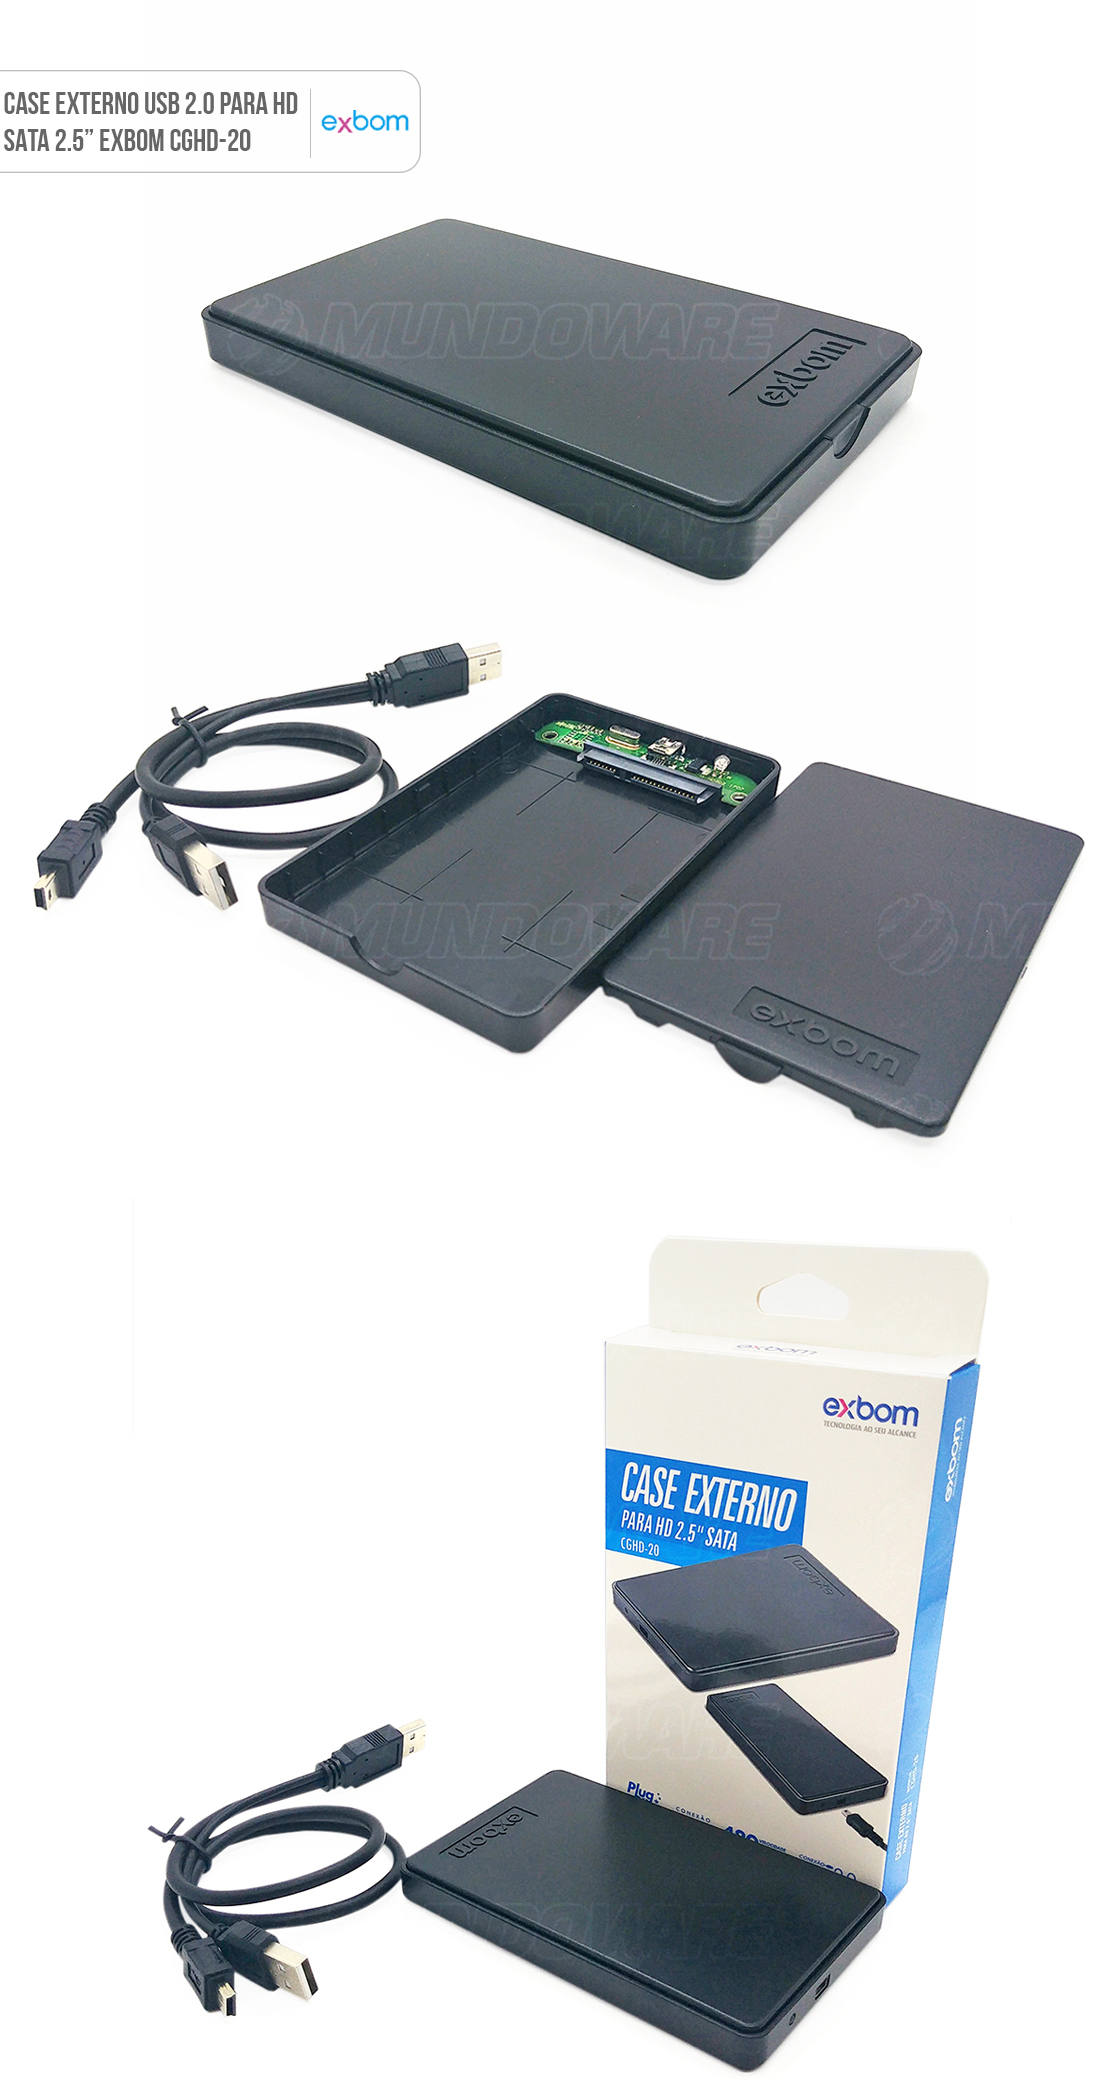 Case USB 2.0 para HD Externo SATA II em ABS compacto